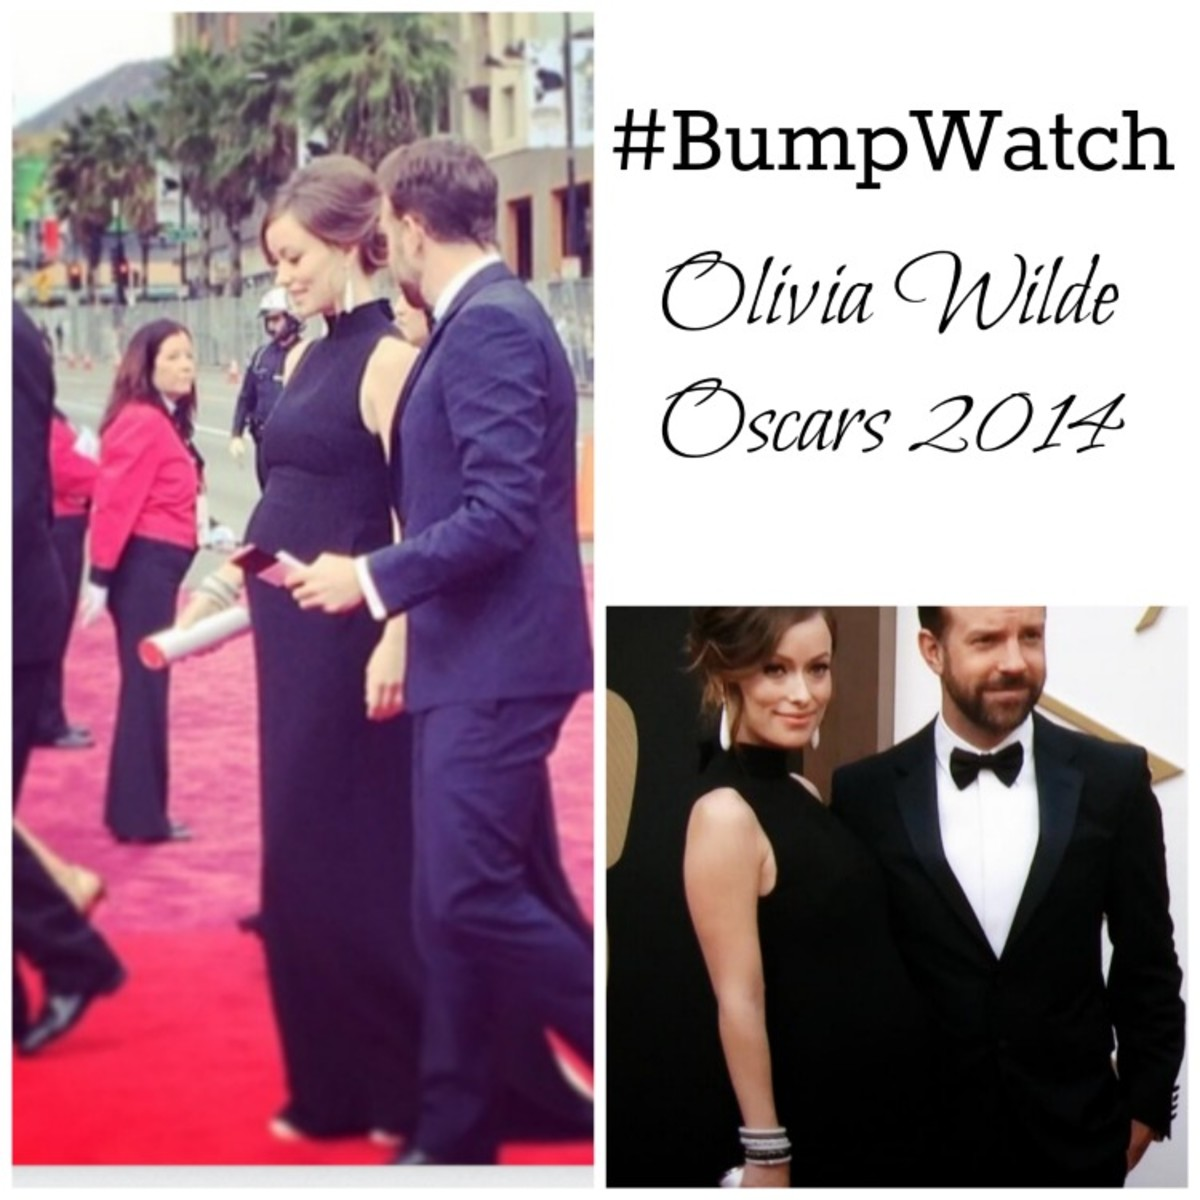 Olivia Wilde Oscars.jpg